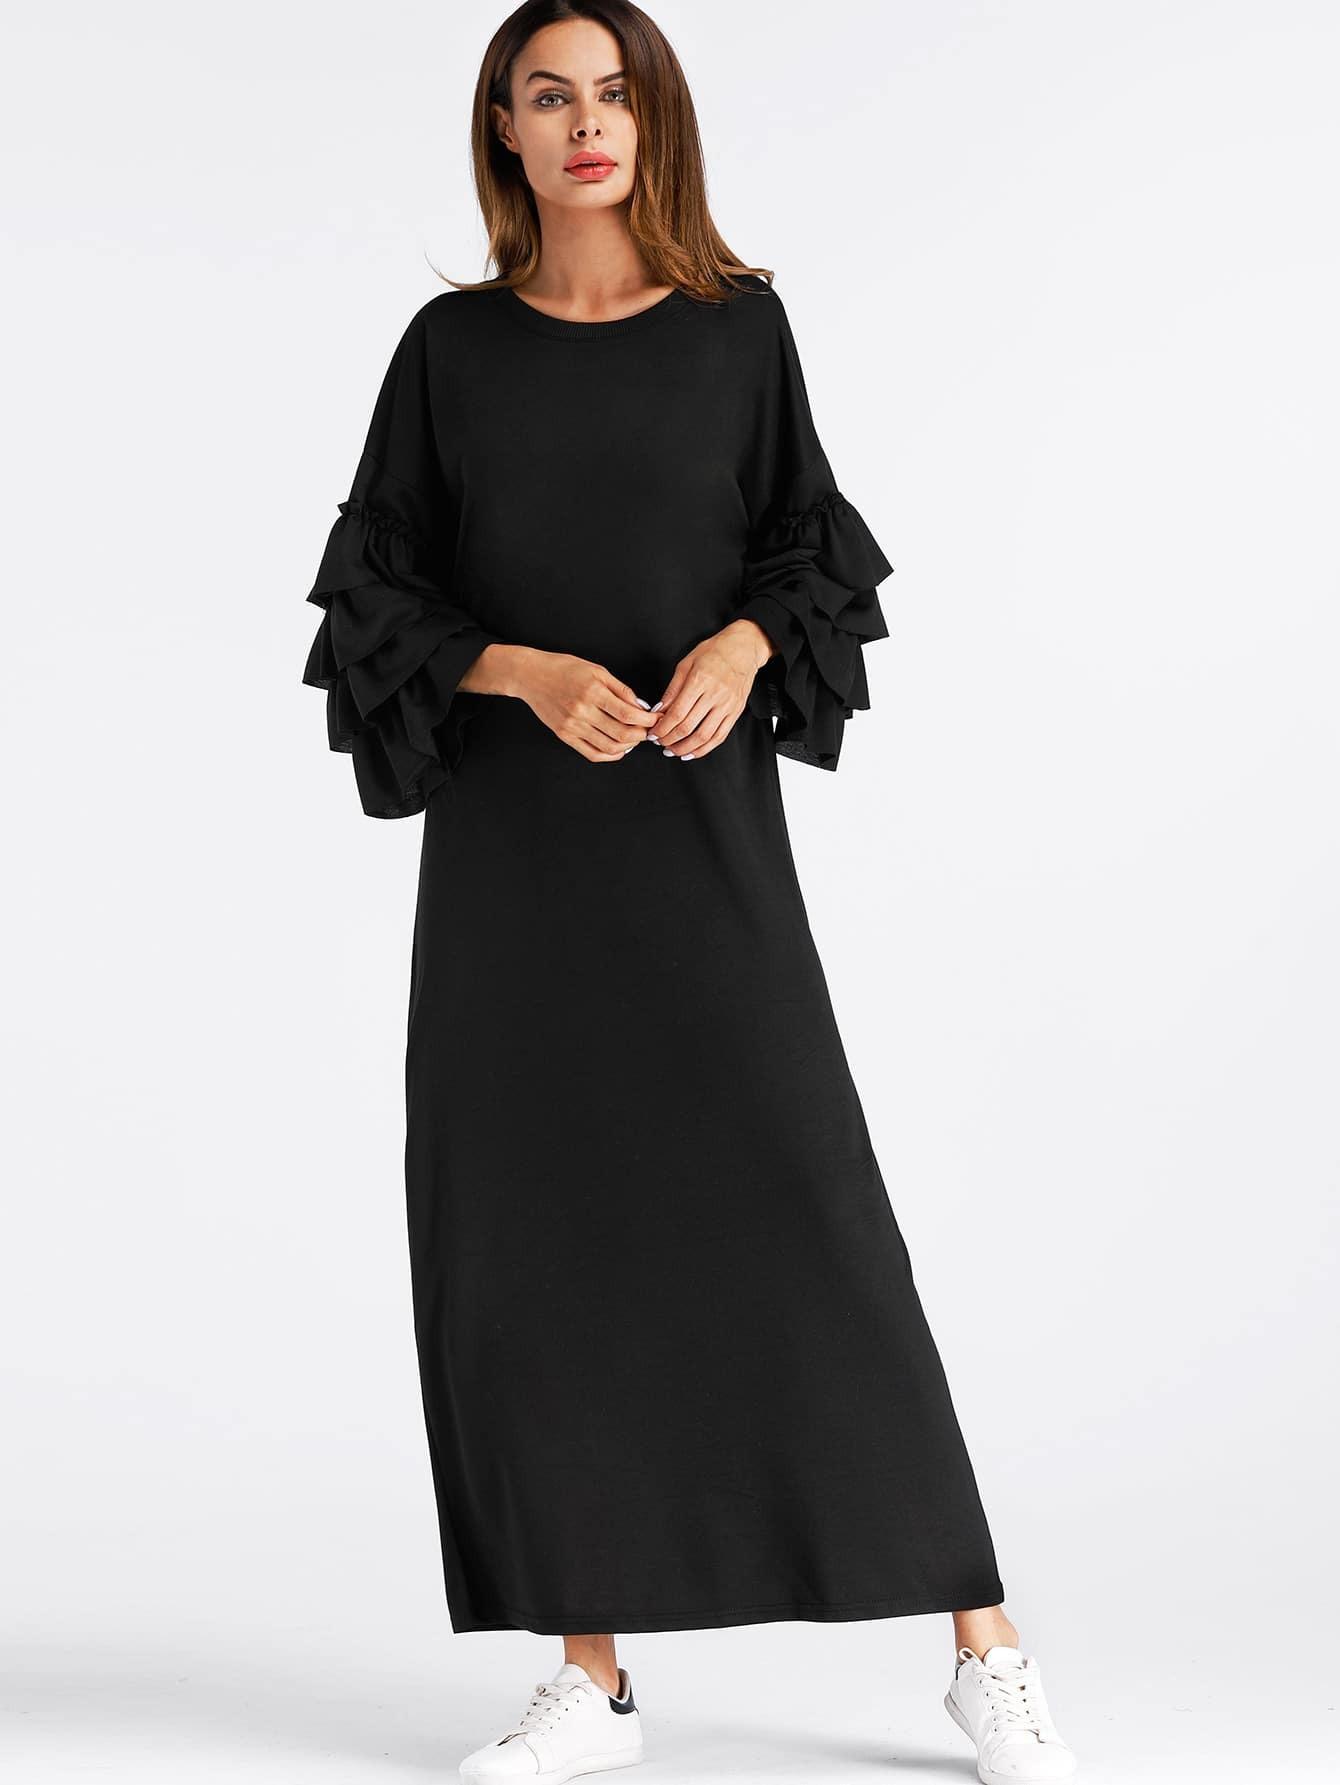 Tiered Frill Sleeve Long Hijab Dress